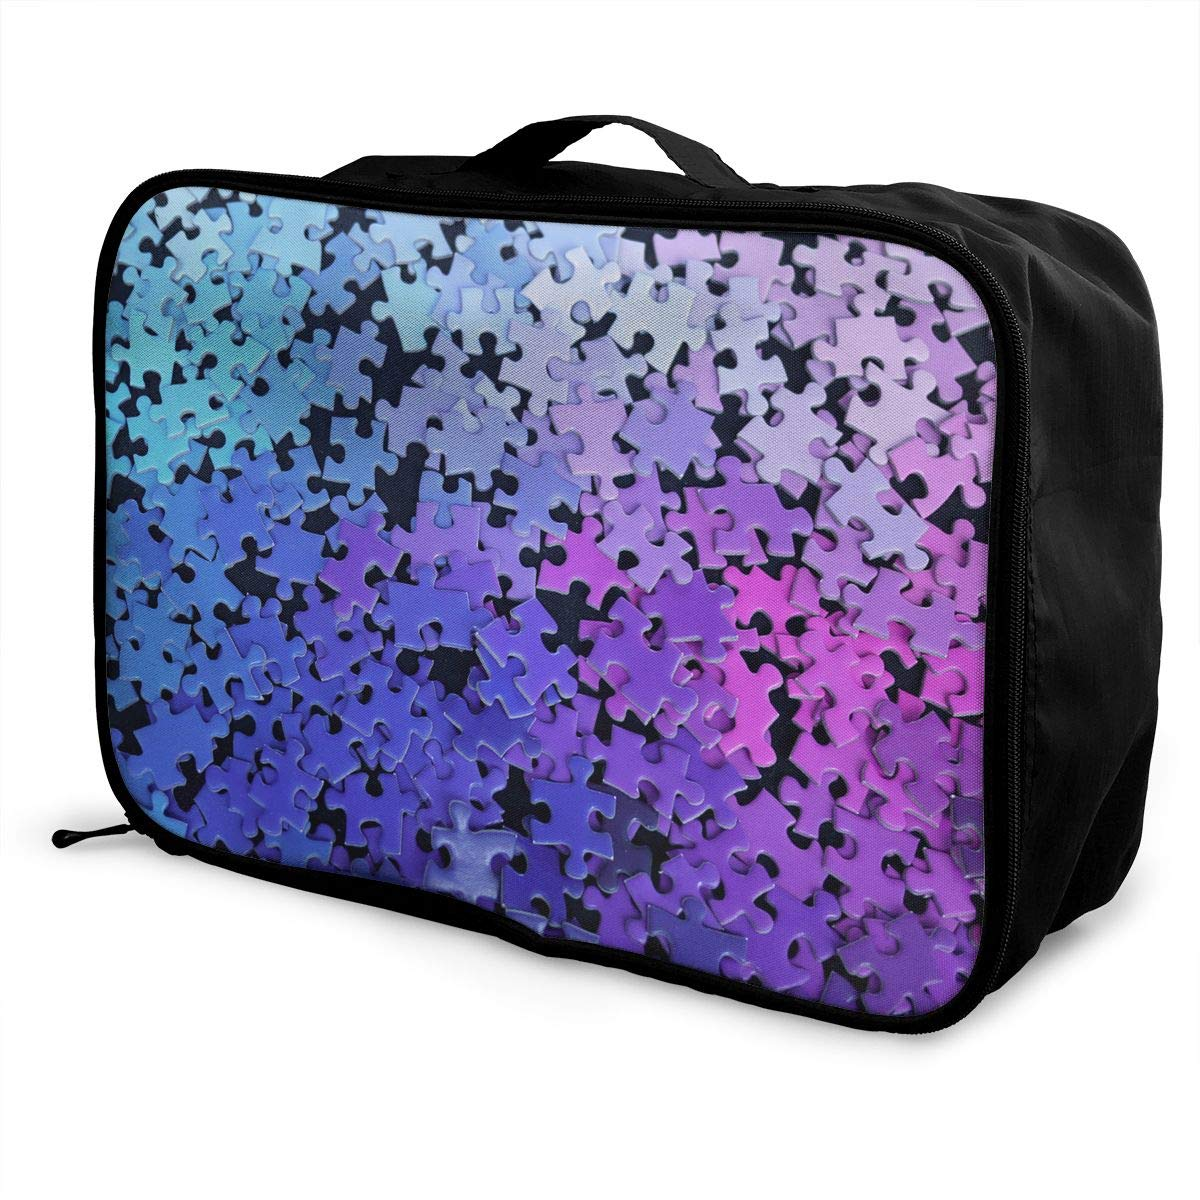 Travel Luggage Duffle Bag Lightweight Portable Handbag Rainbow Puzzle Print Large Capacity Waterproof Foldable Storage Tote